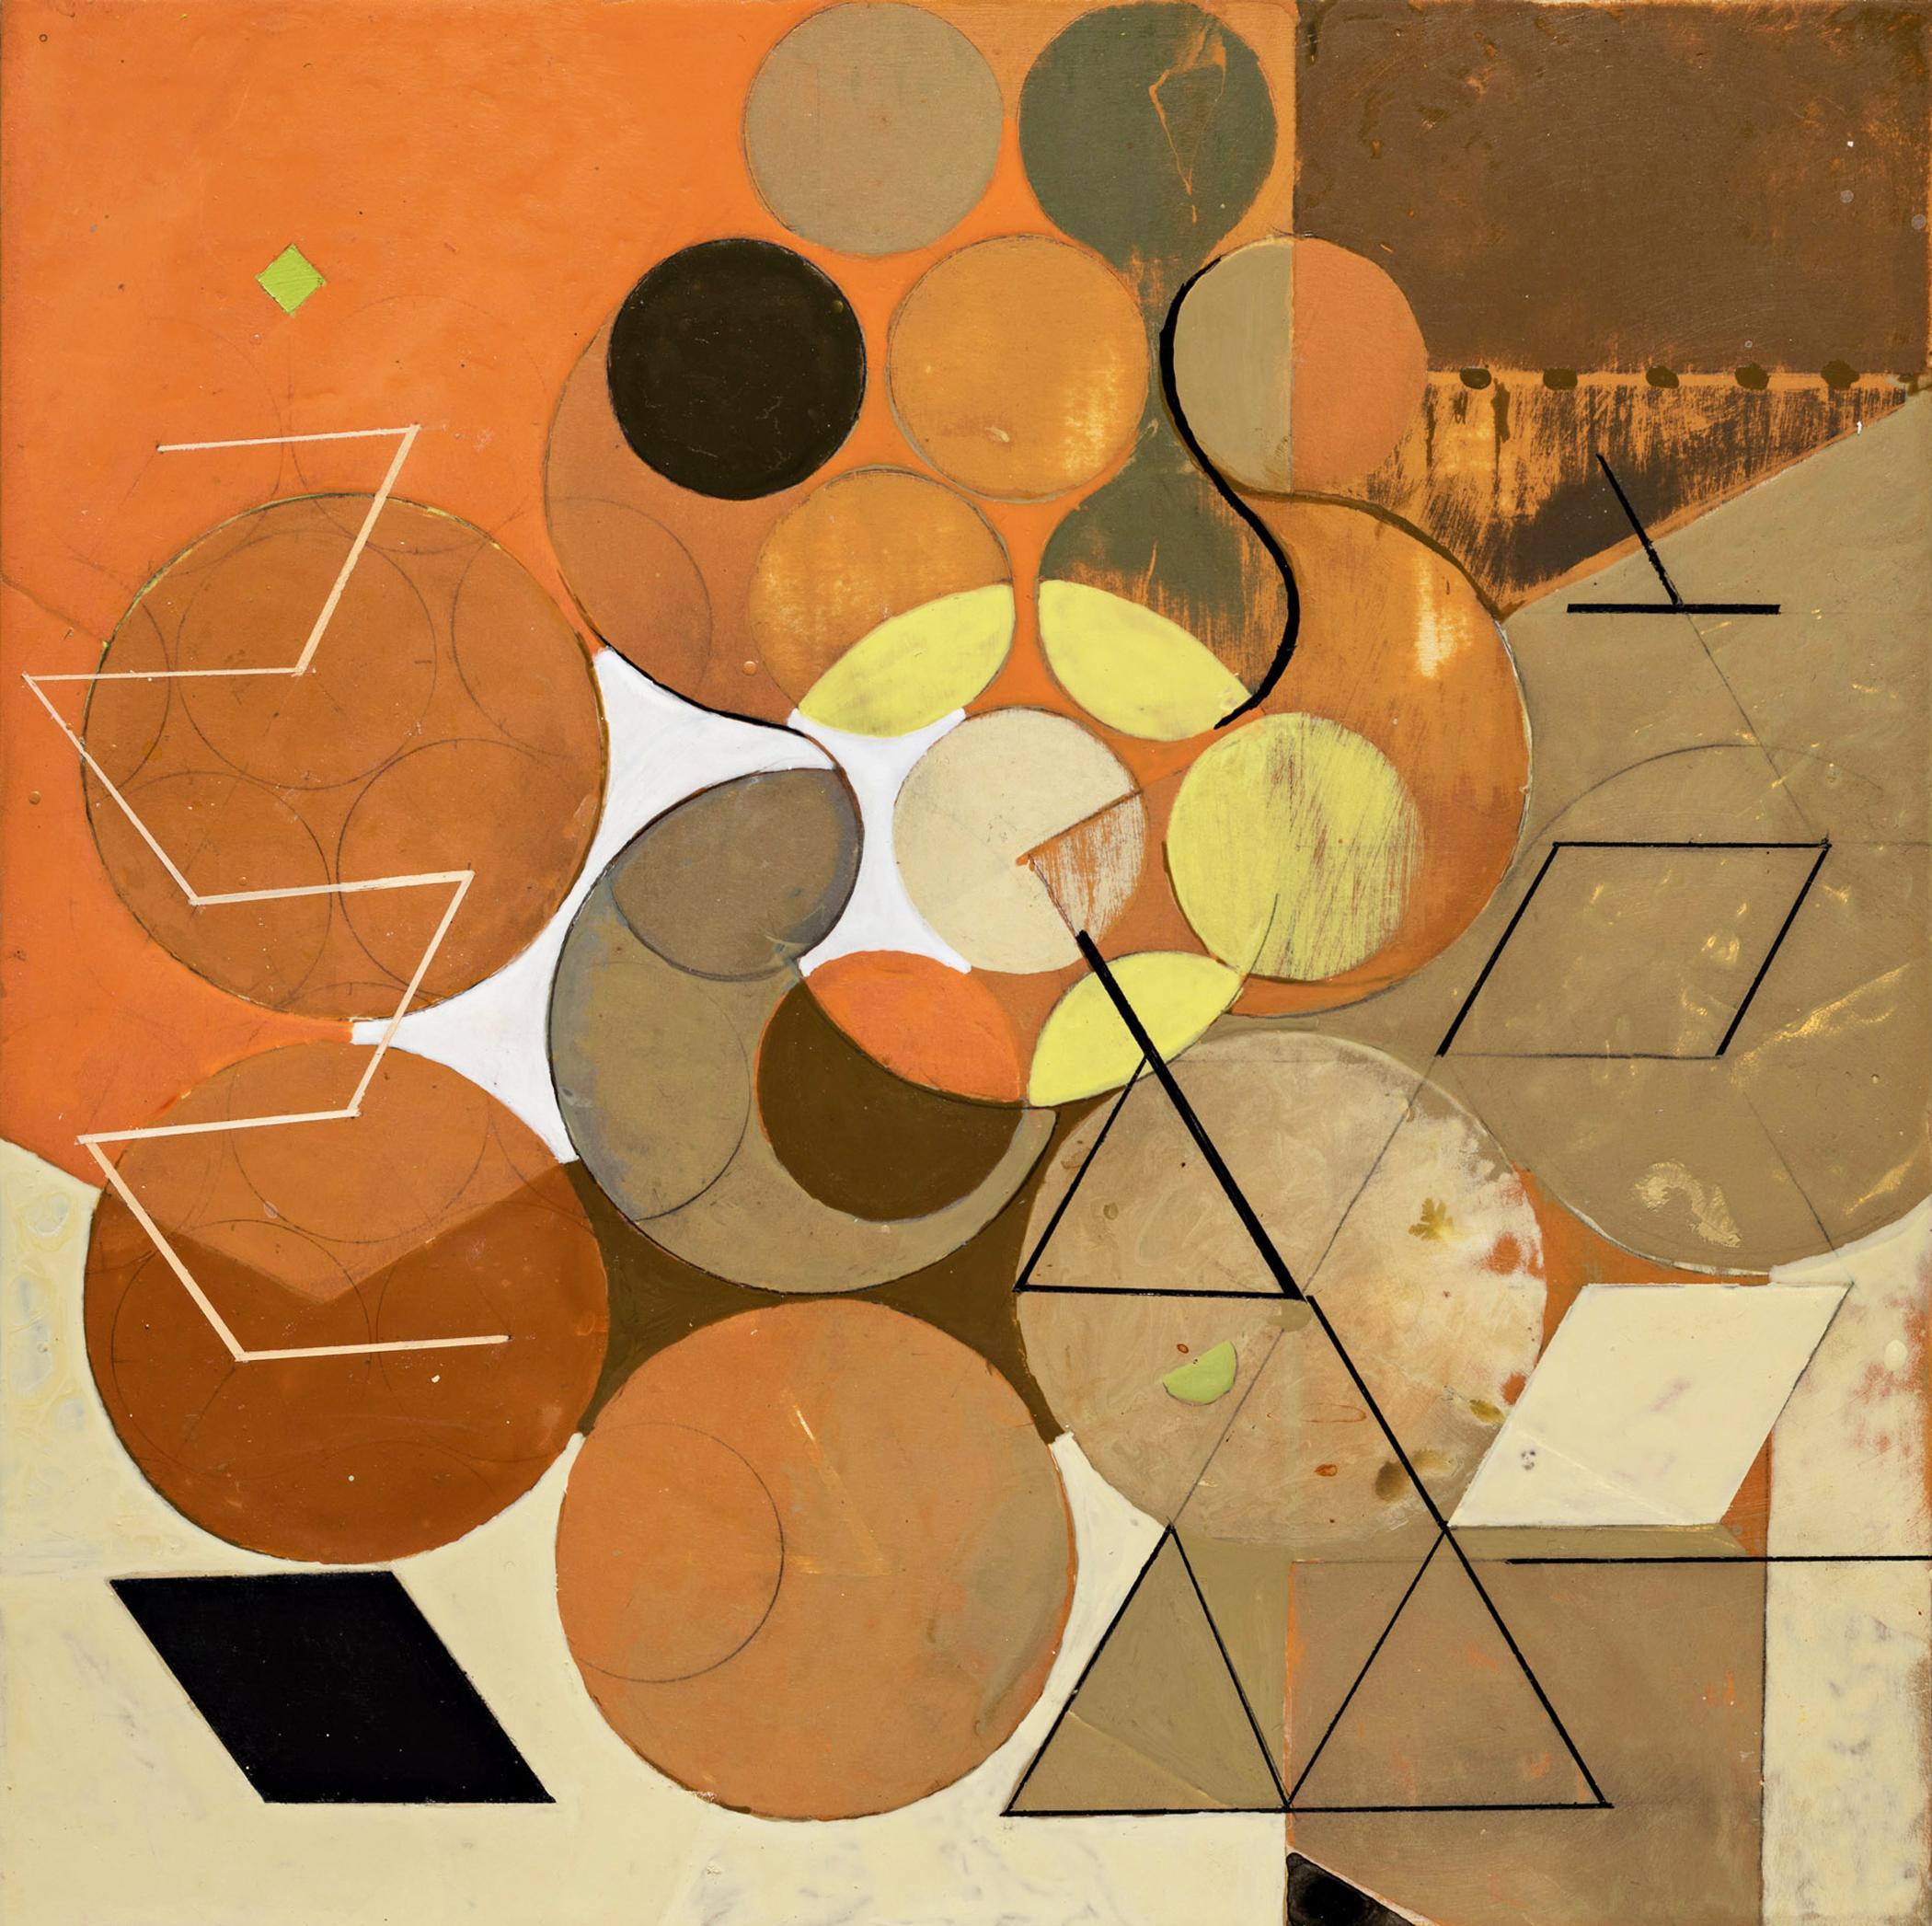 Goddess of the Subtle Matrix #1 (Abstract geometric painting, Orange & Neutrals)